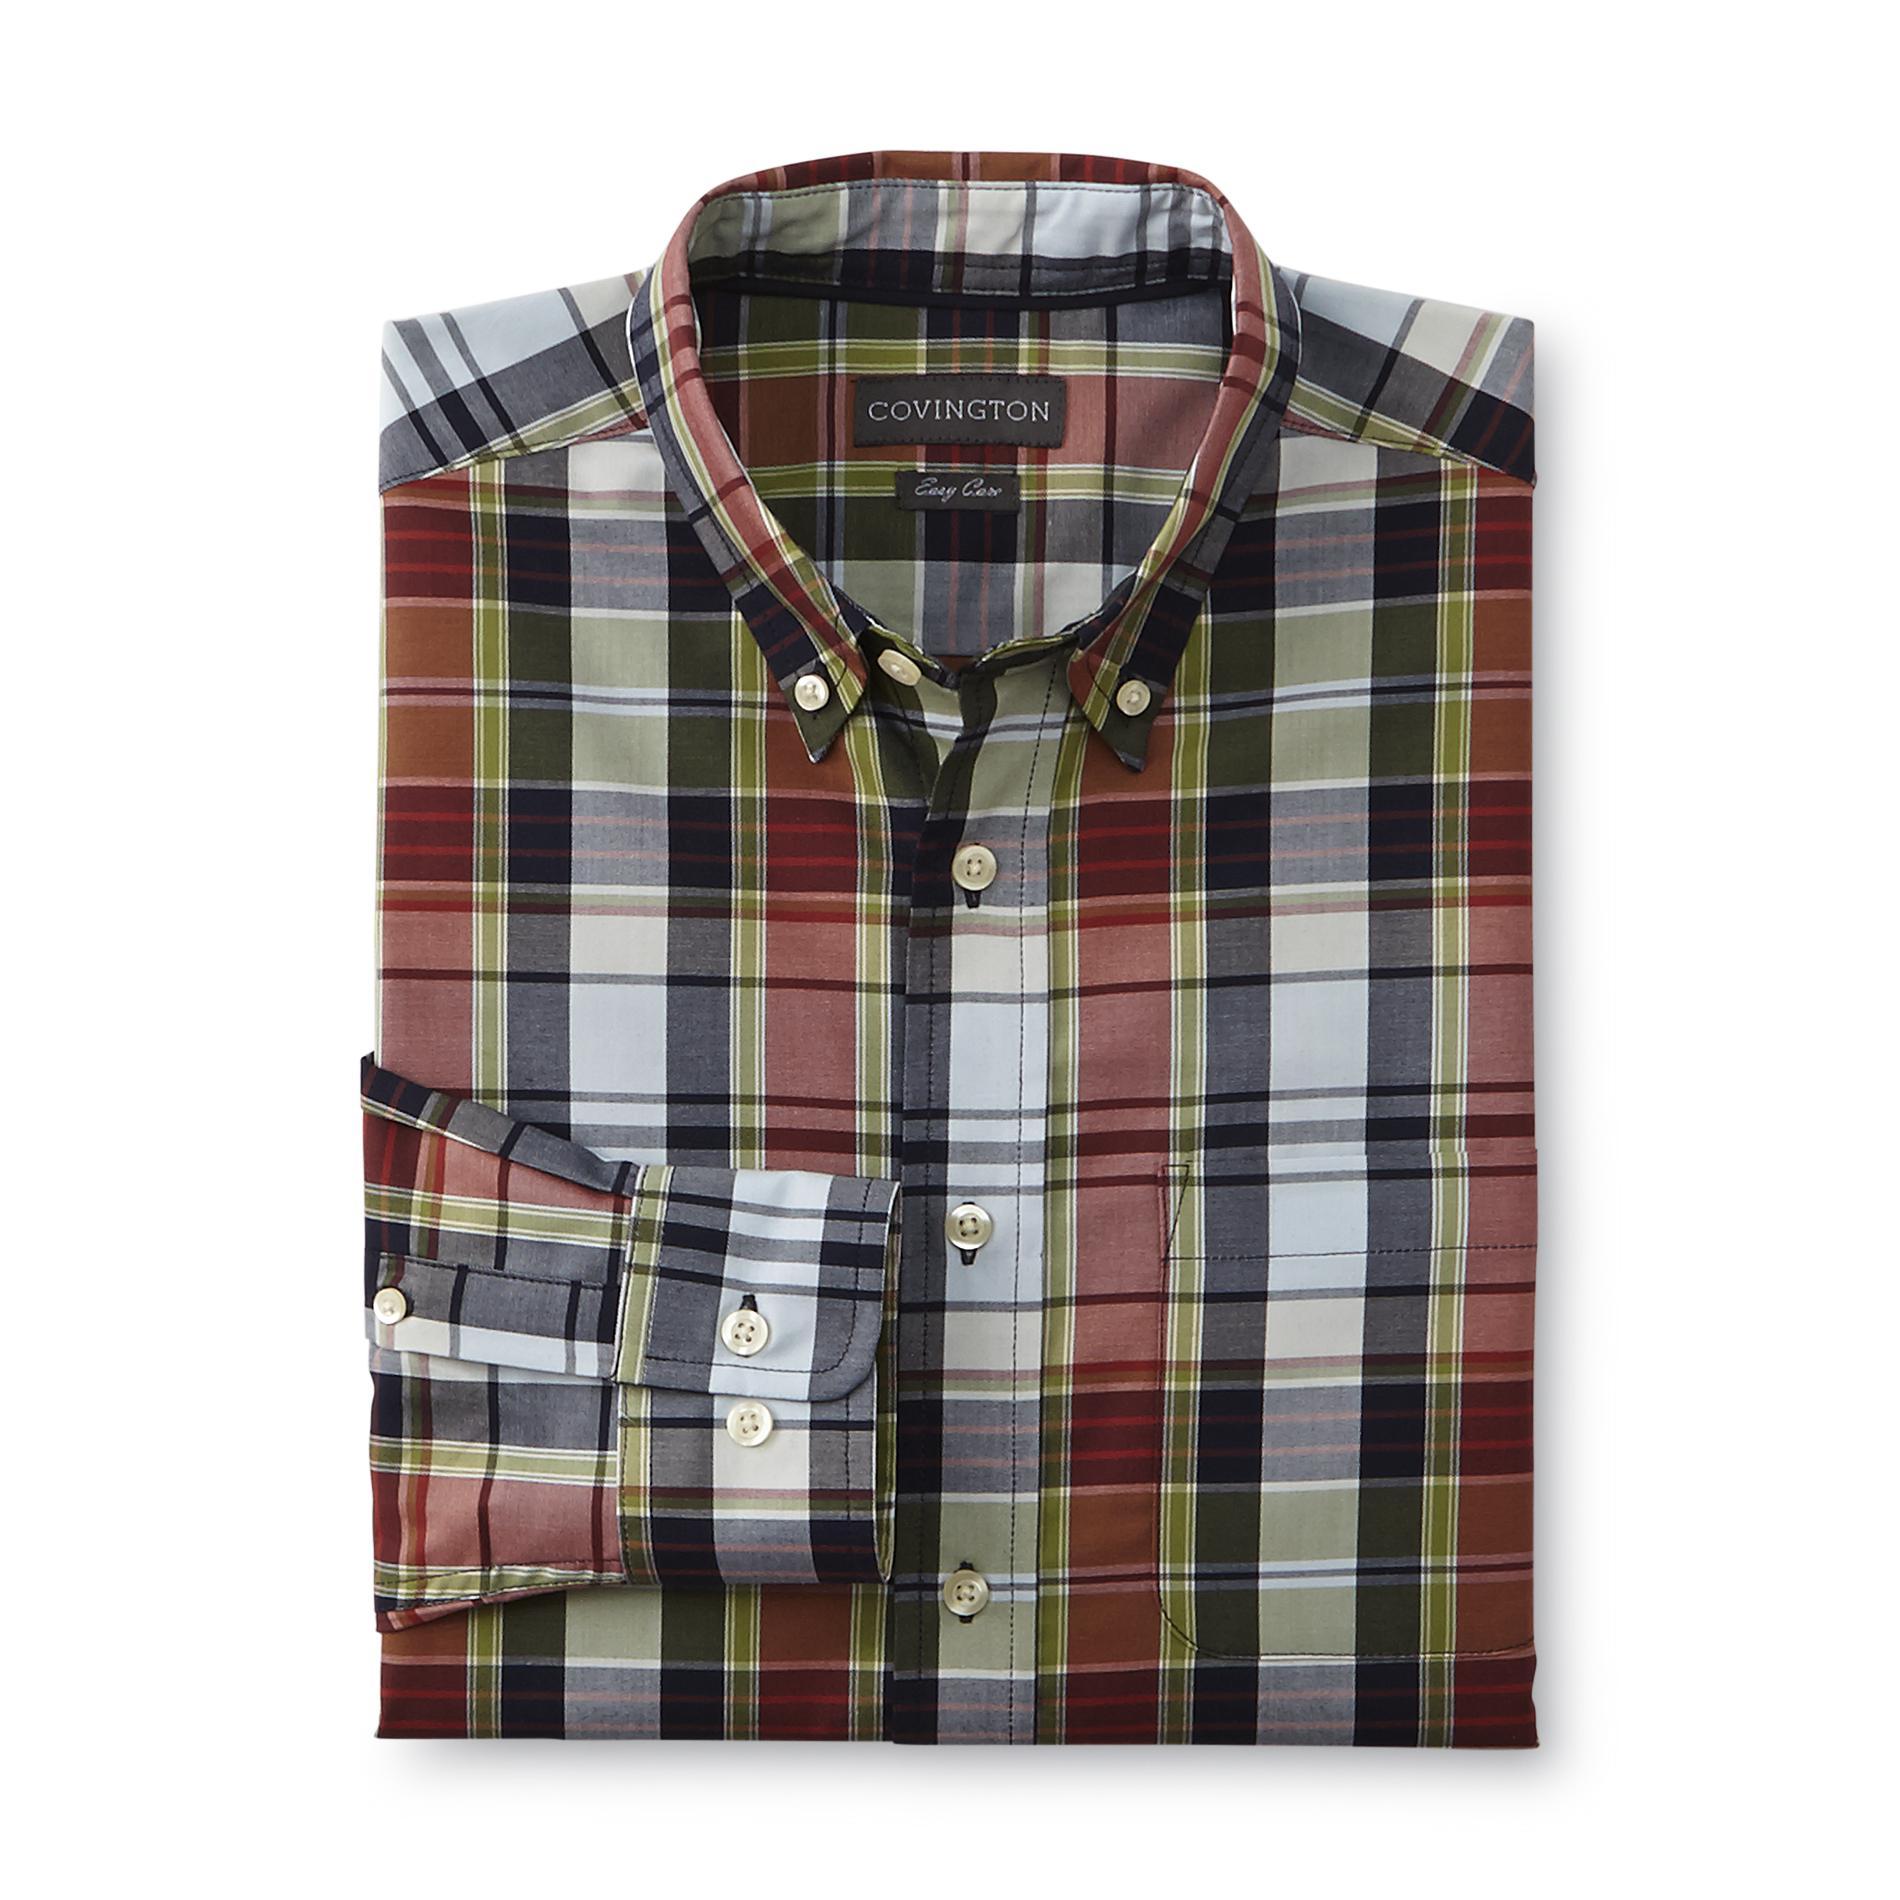 Covington Men's Easy Care Long-Sleeve Shirt - Plaid